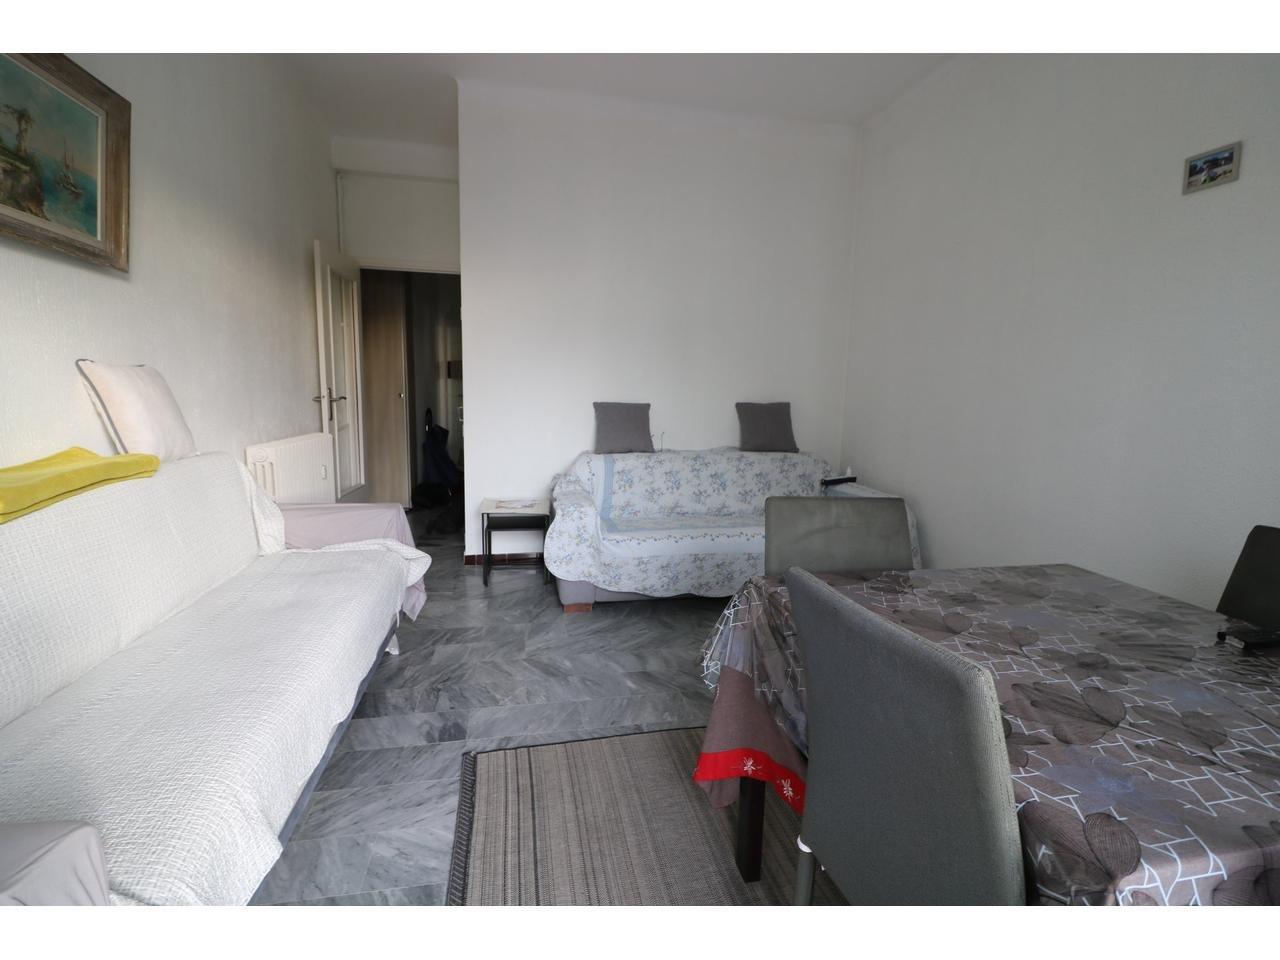 Appartement  2 Locali 42.3m2  In vendita   260000 €